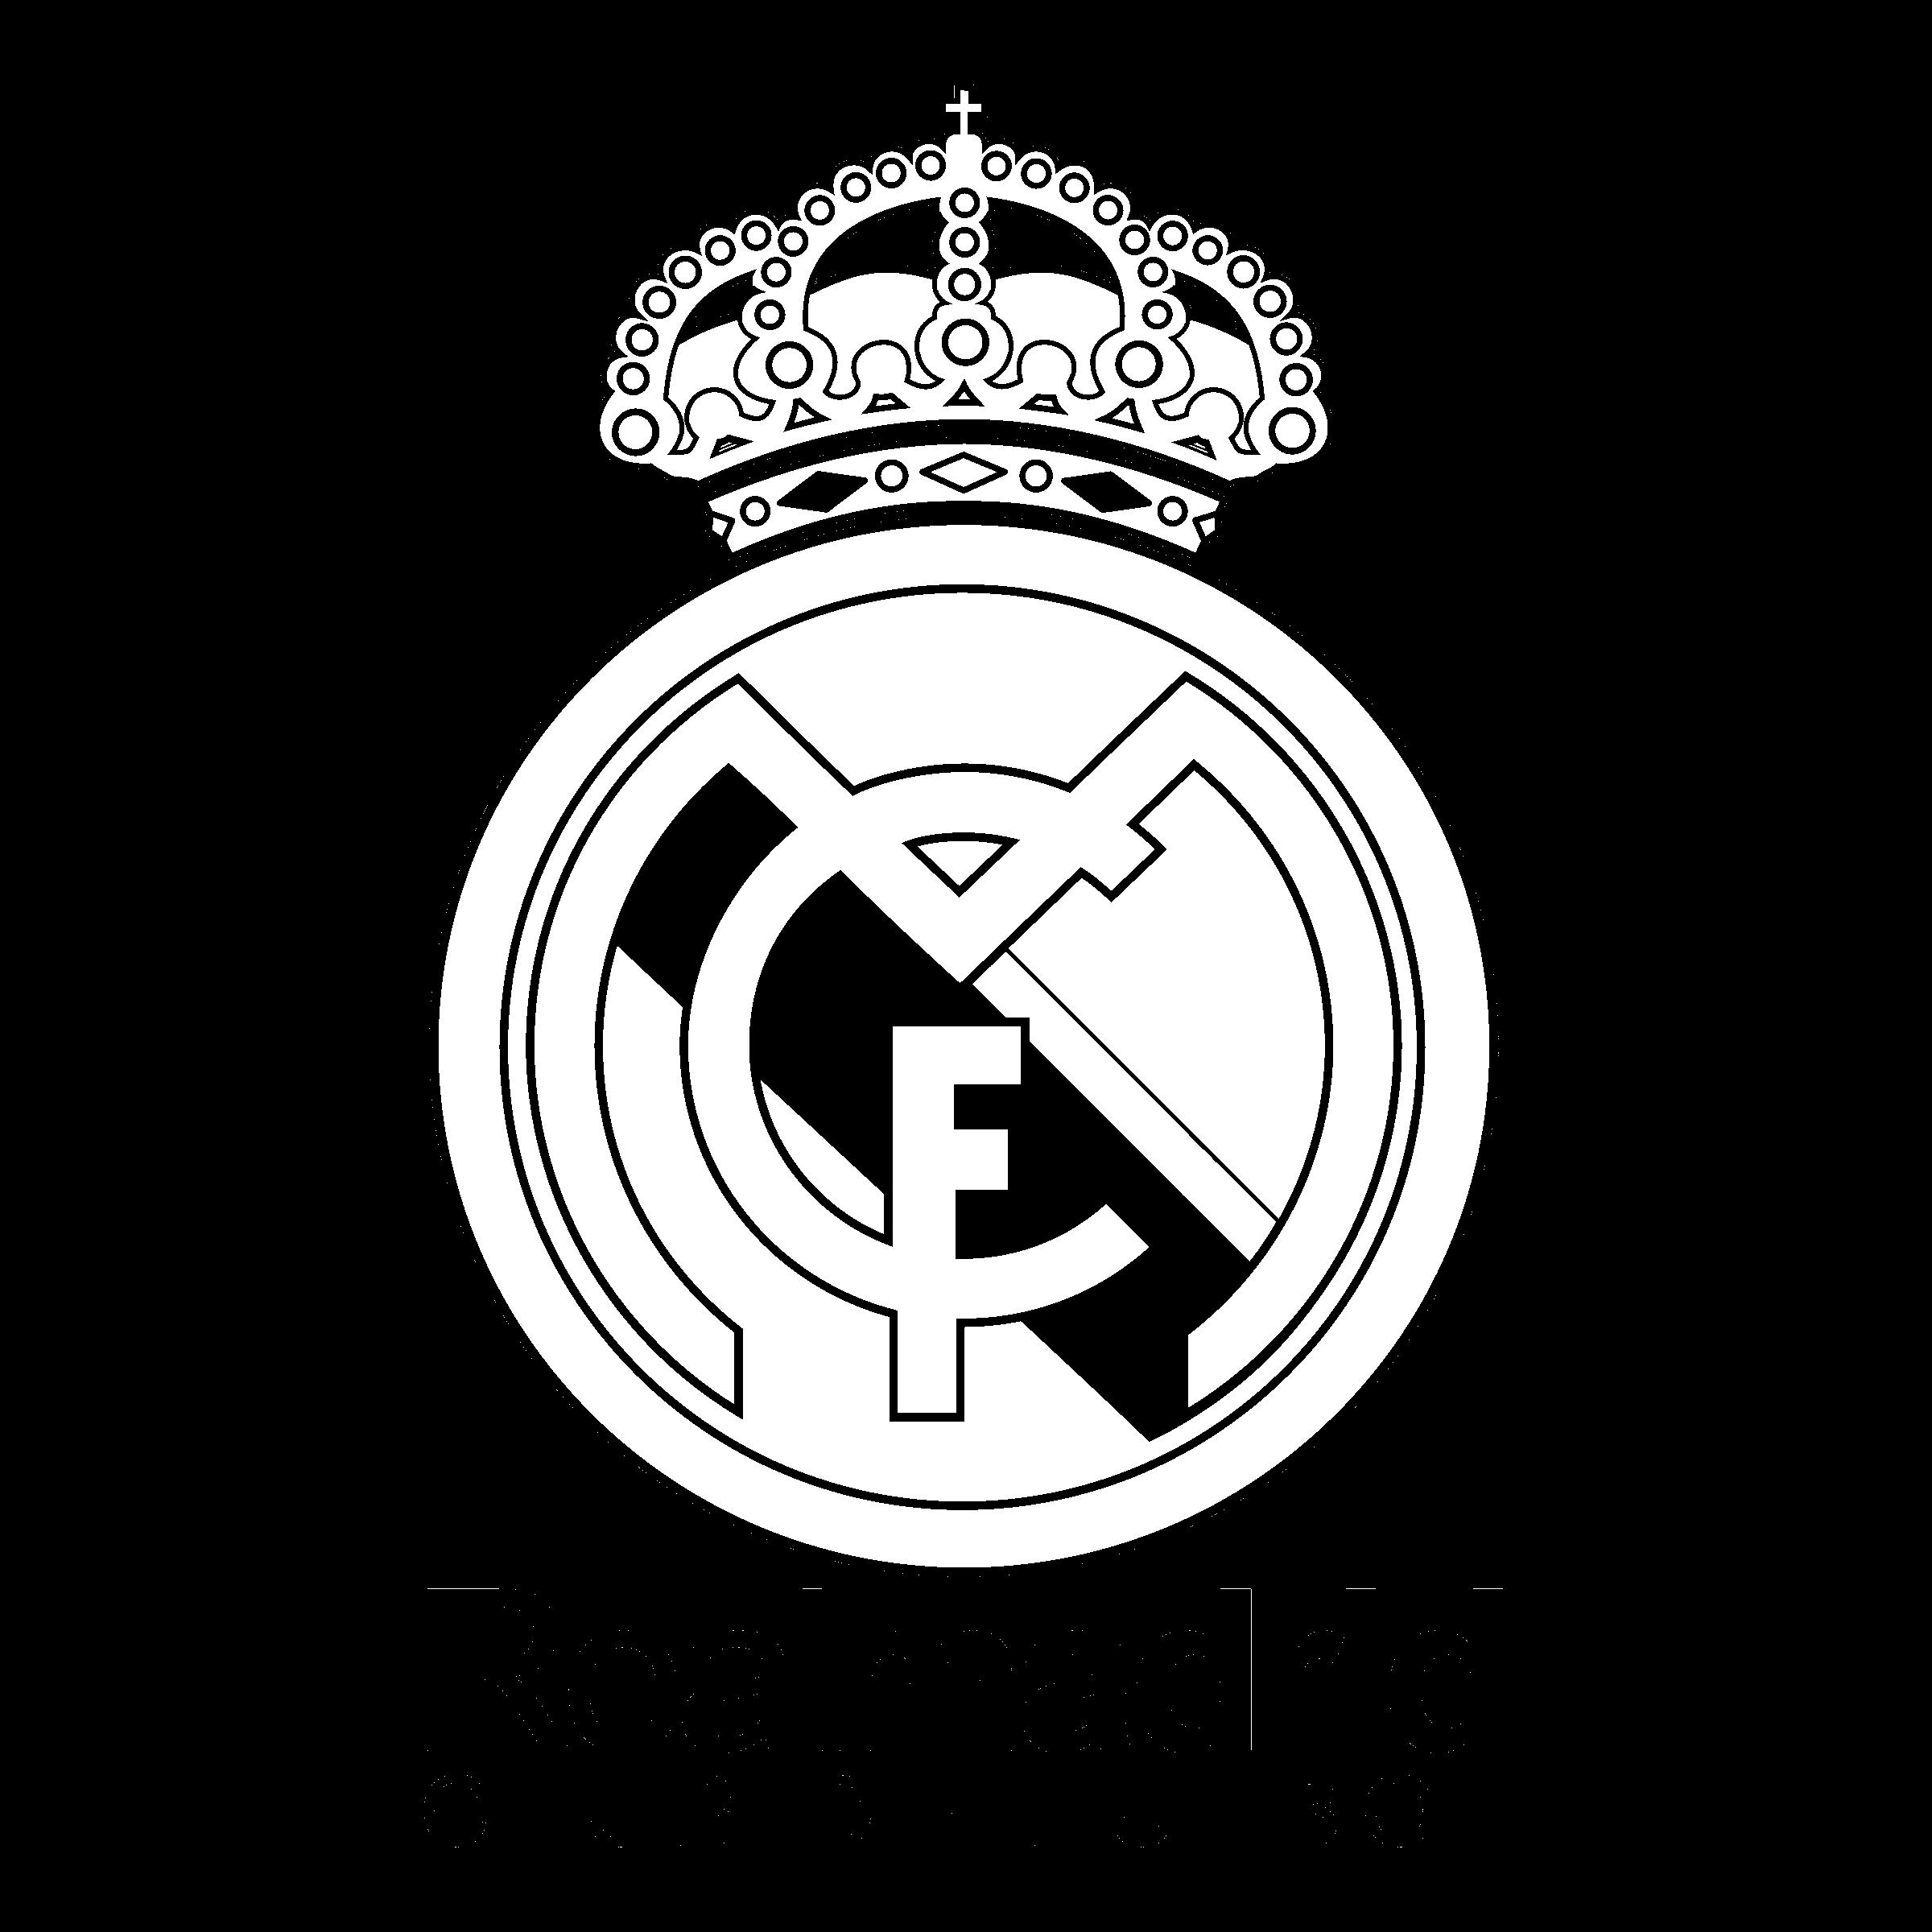 Real madrid logo 3d png